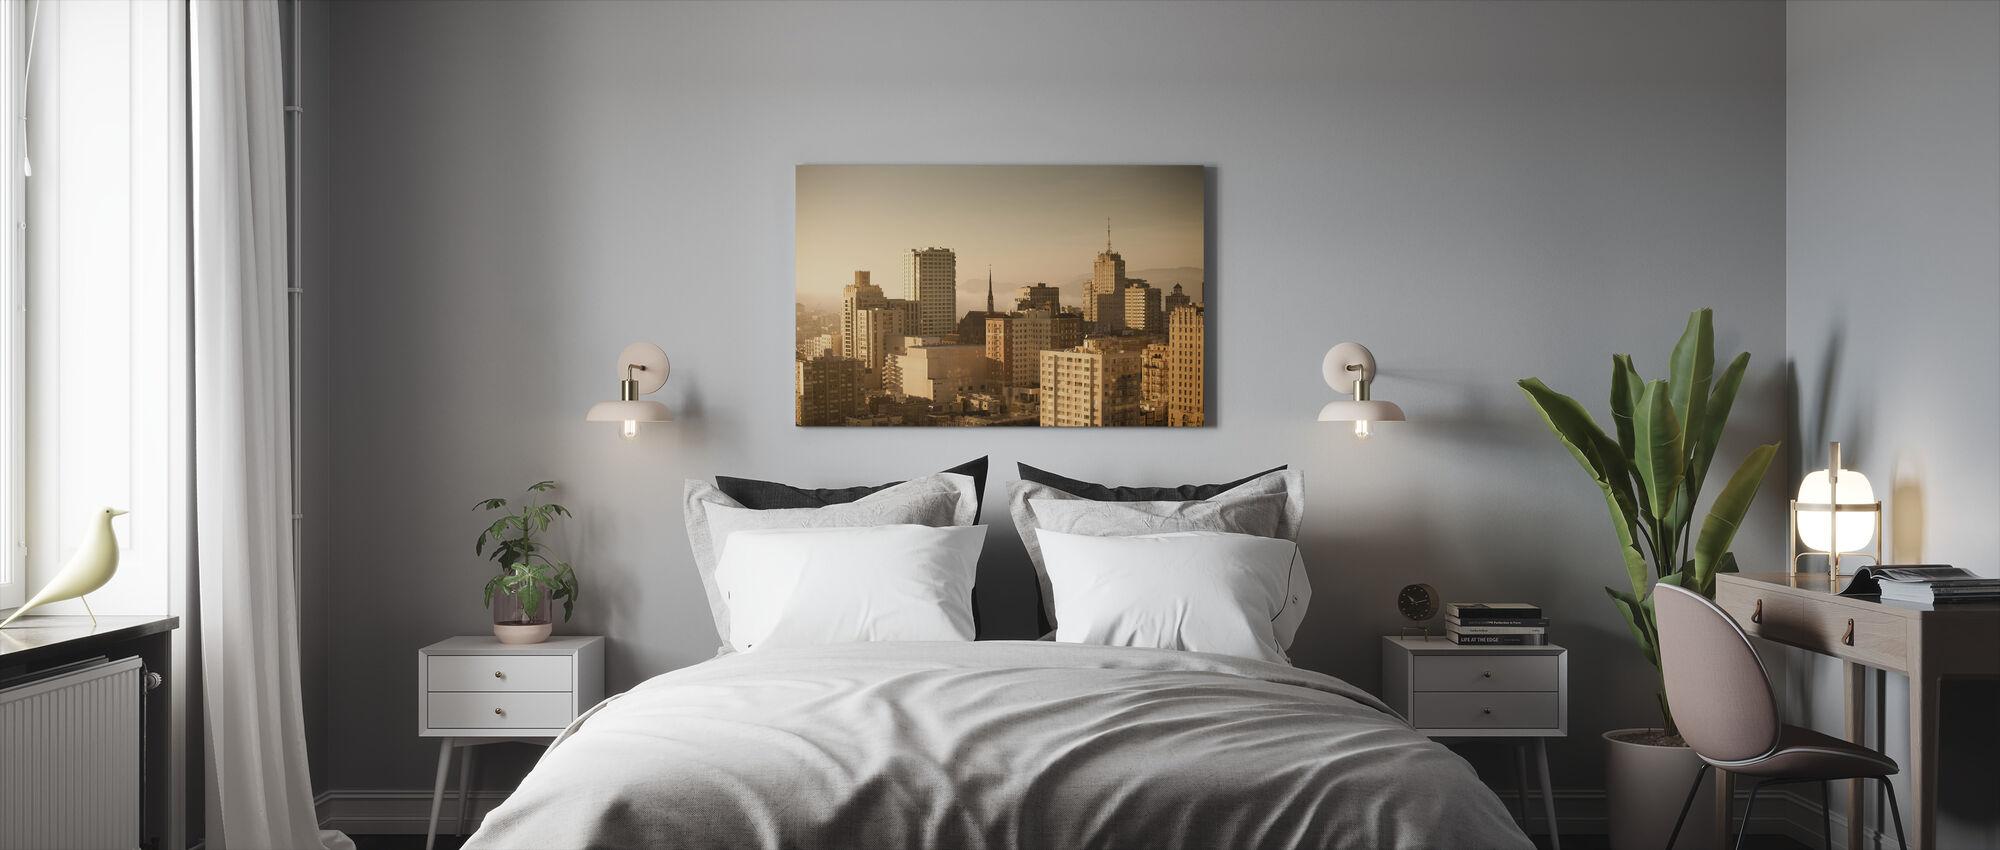 Sparkling San Francisco - Canvas print - Bedroom